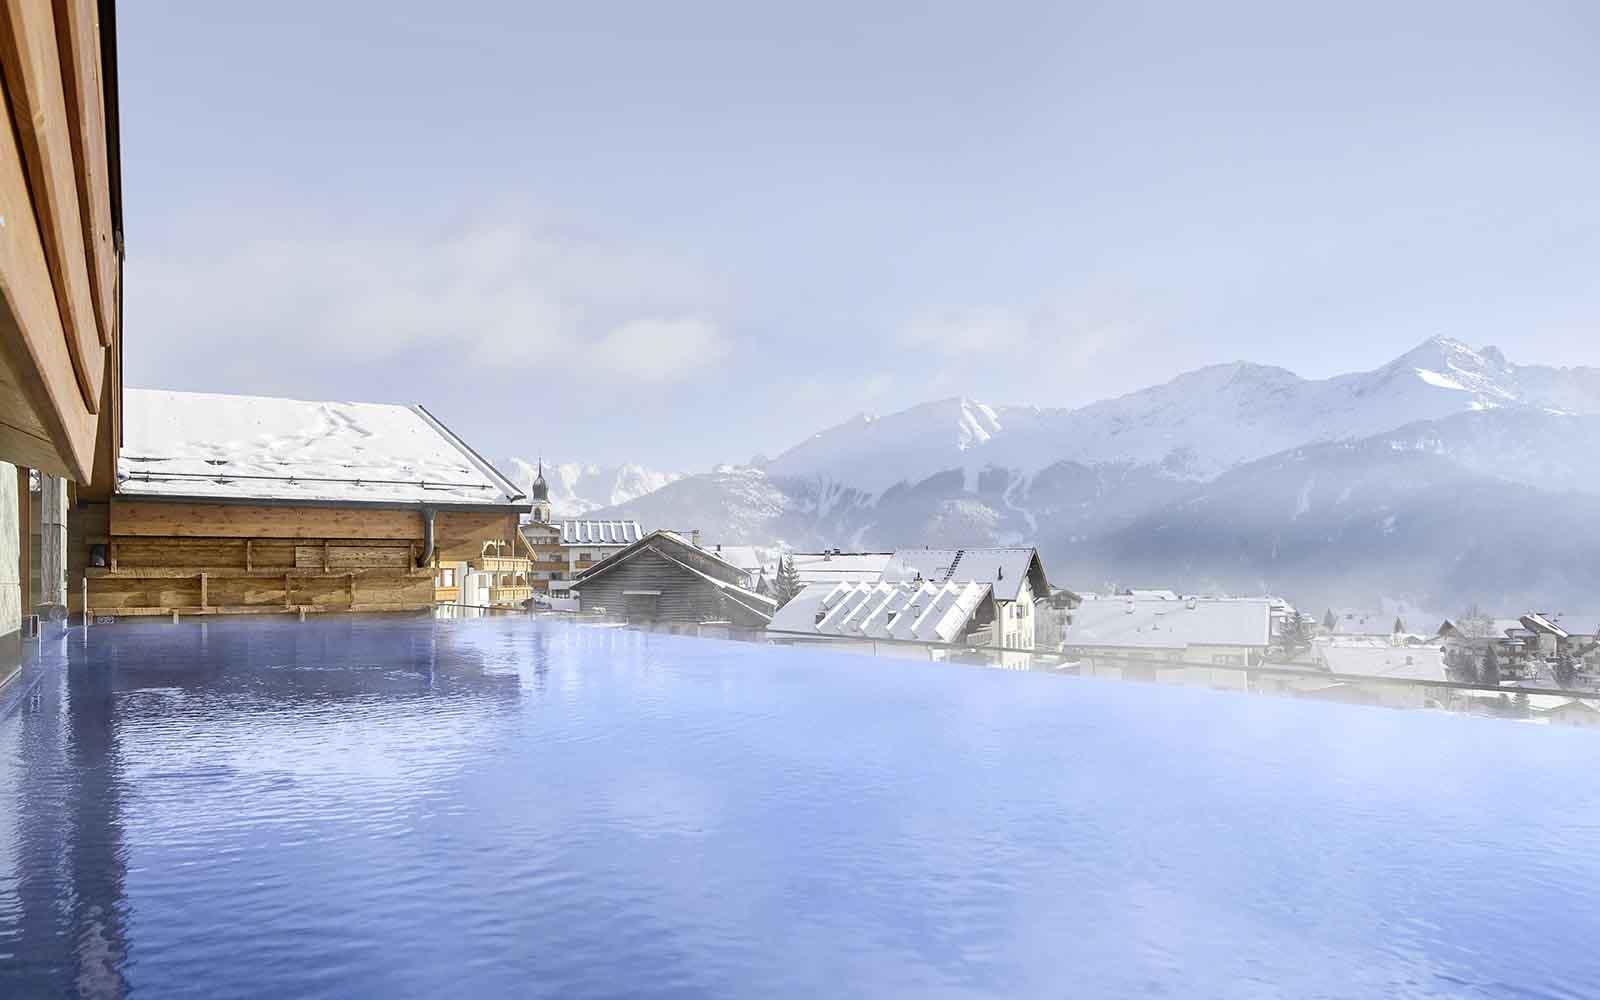 Hotel Tirol Fiss Serfaus-Ladis-Fiss Tyrol Austria Lifestyle-Hotel Winter Holidays Rooftop infinity pool